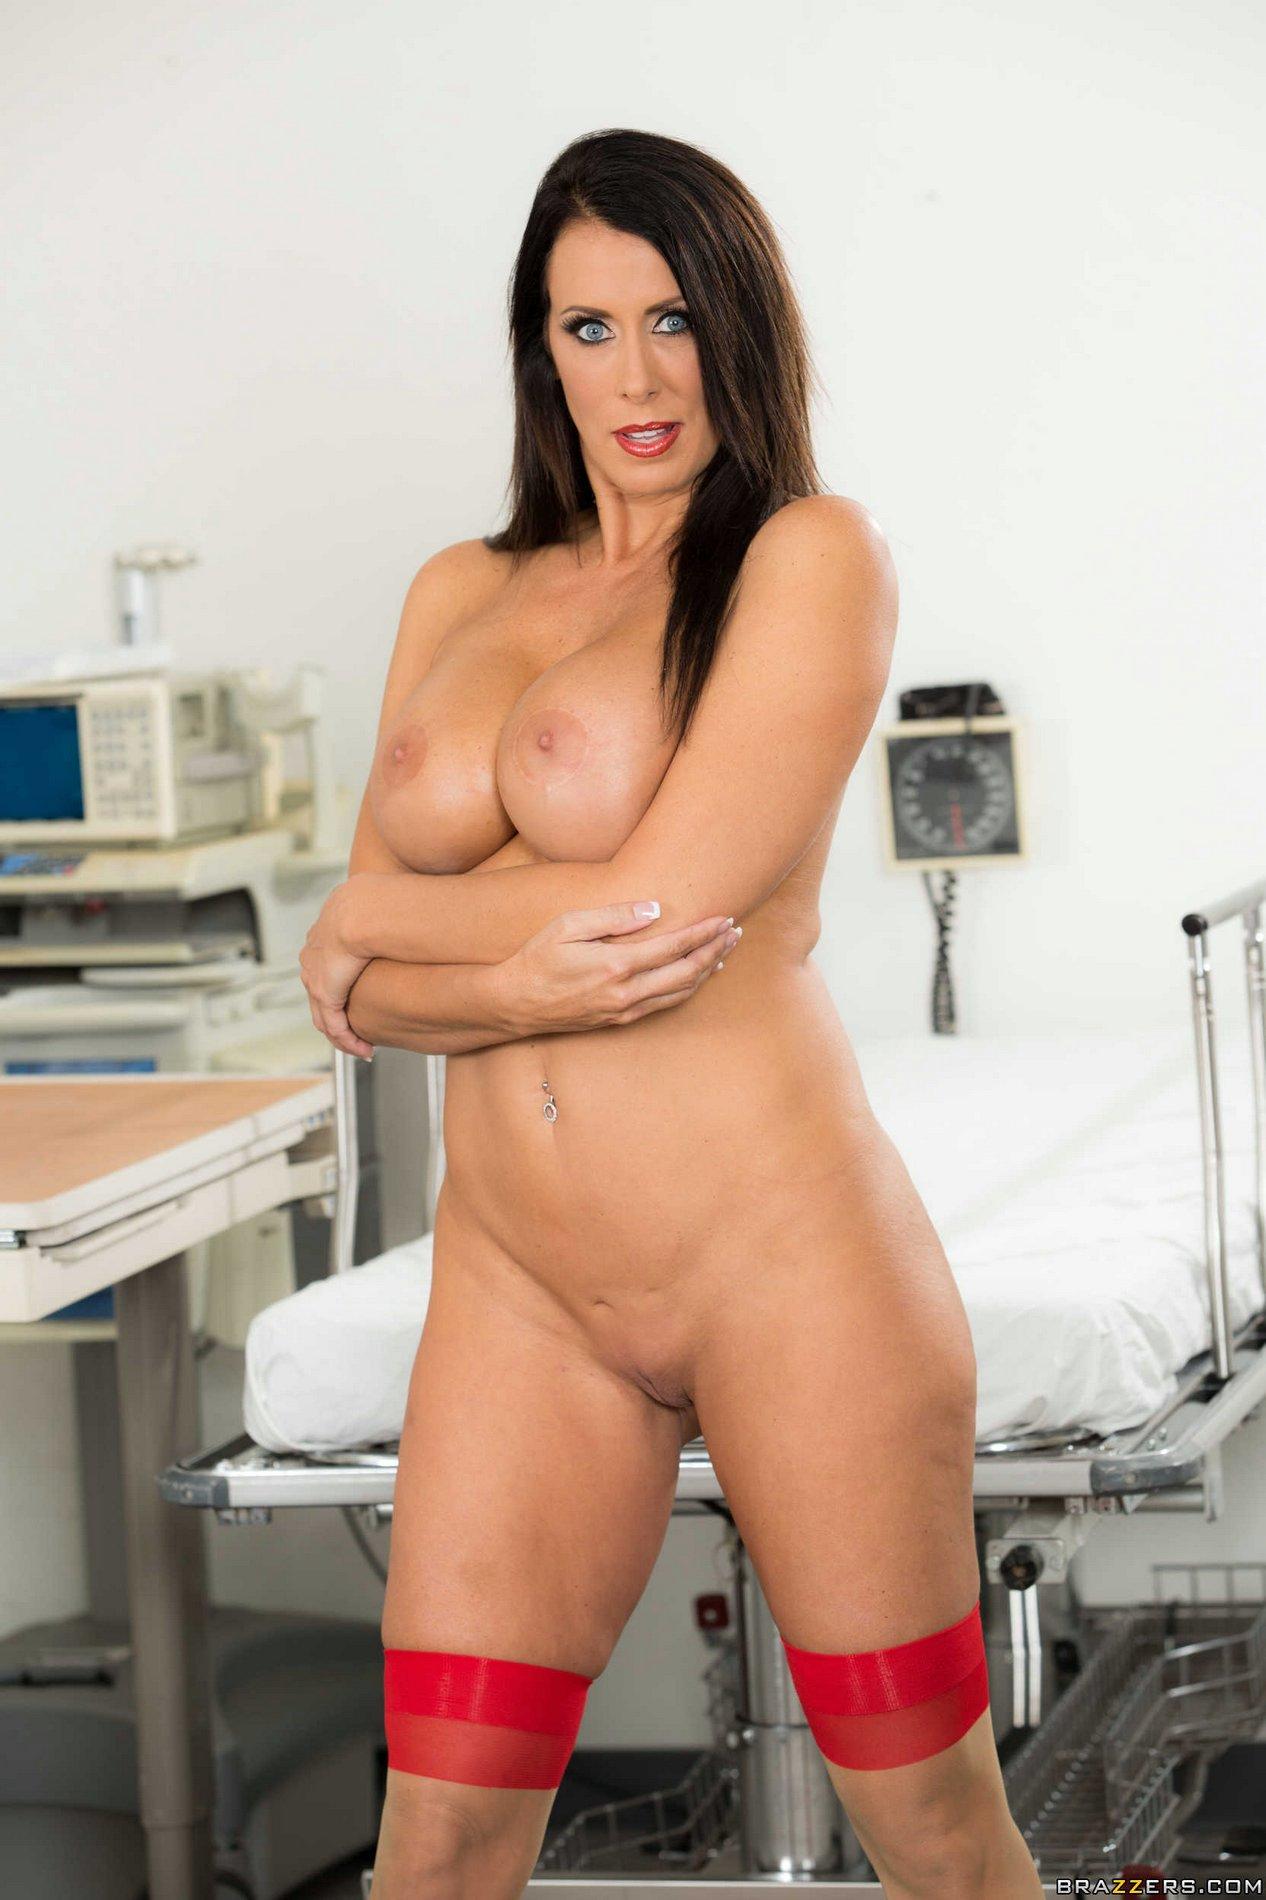 Nurse 1128 videos My Retro Tube  Free vintage porn videos